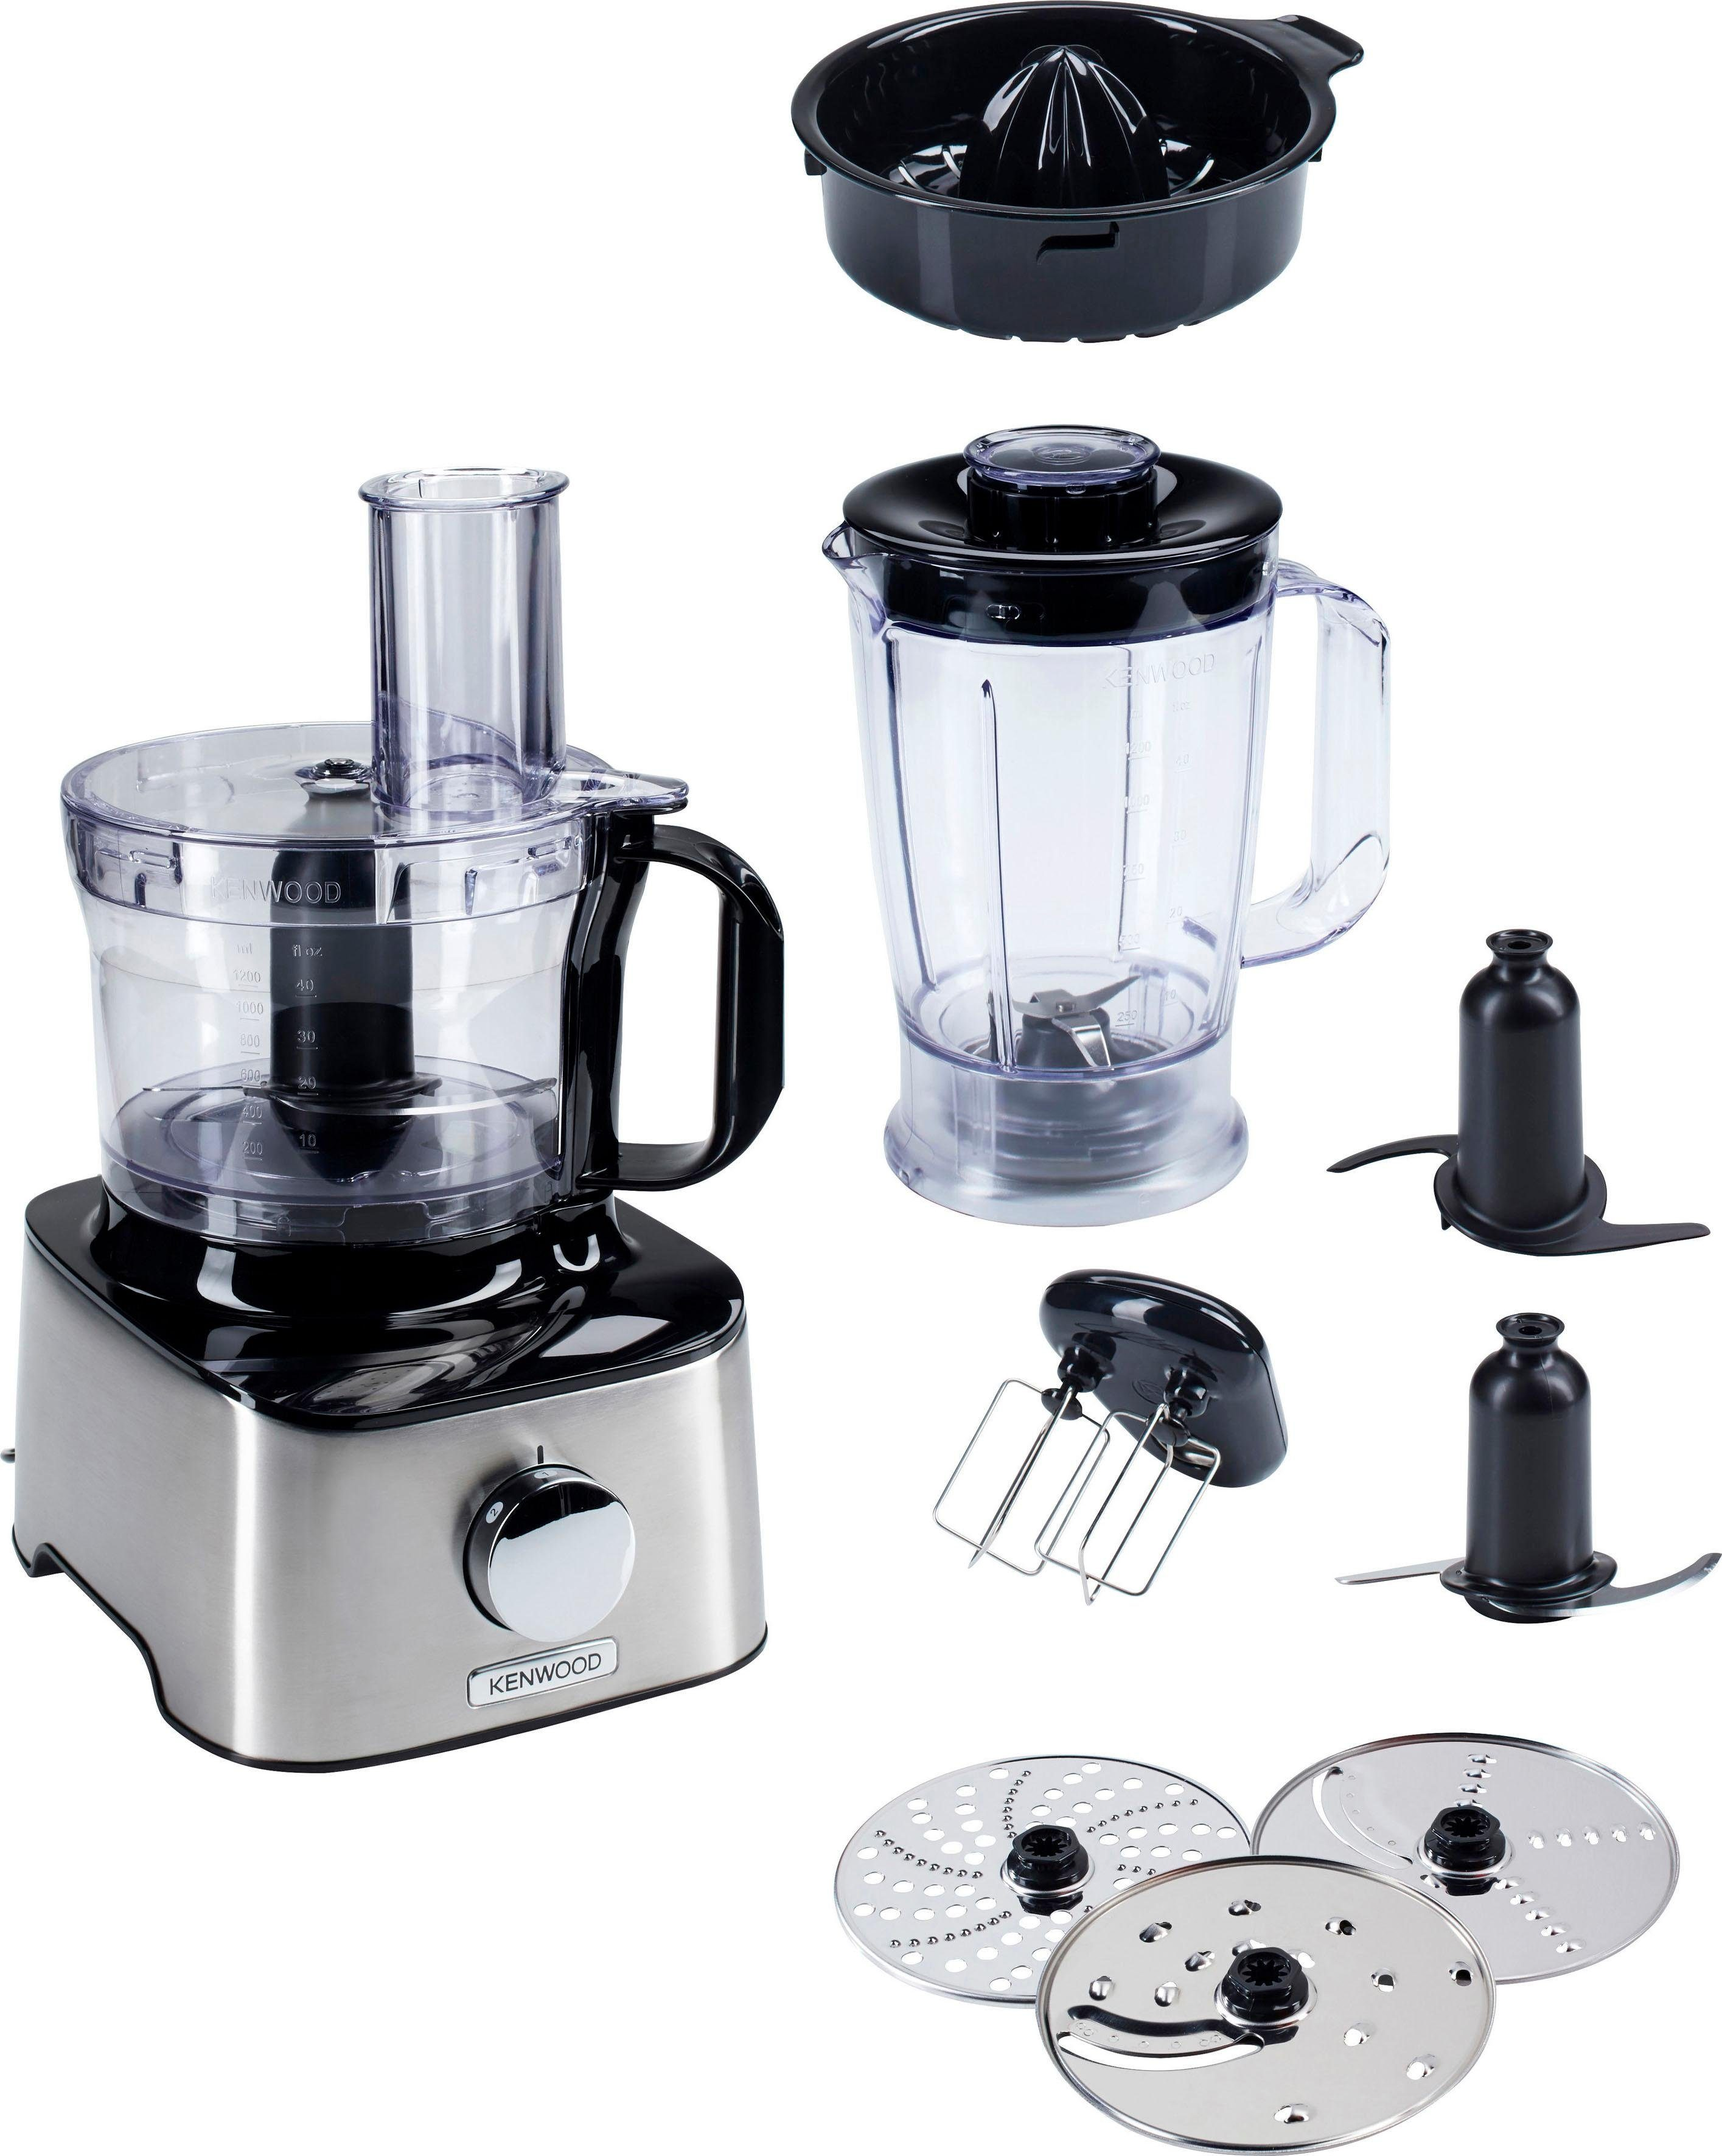 KENWOOD Küchenmaschine Multipro Compact FDM301SS, 800 W, 2,1 l Schüssel